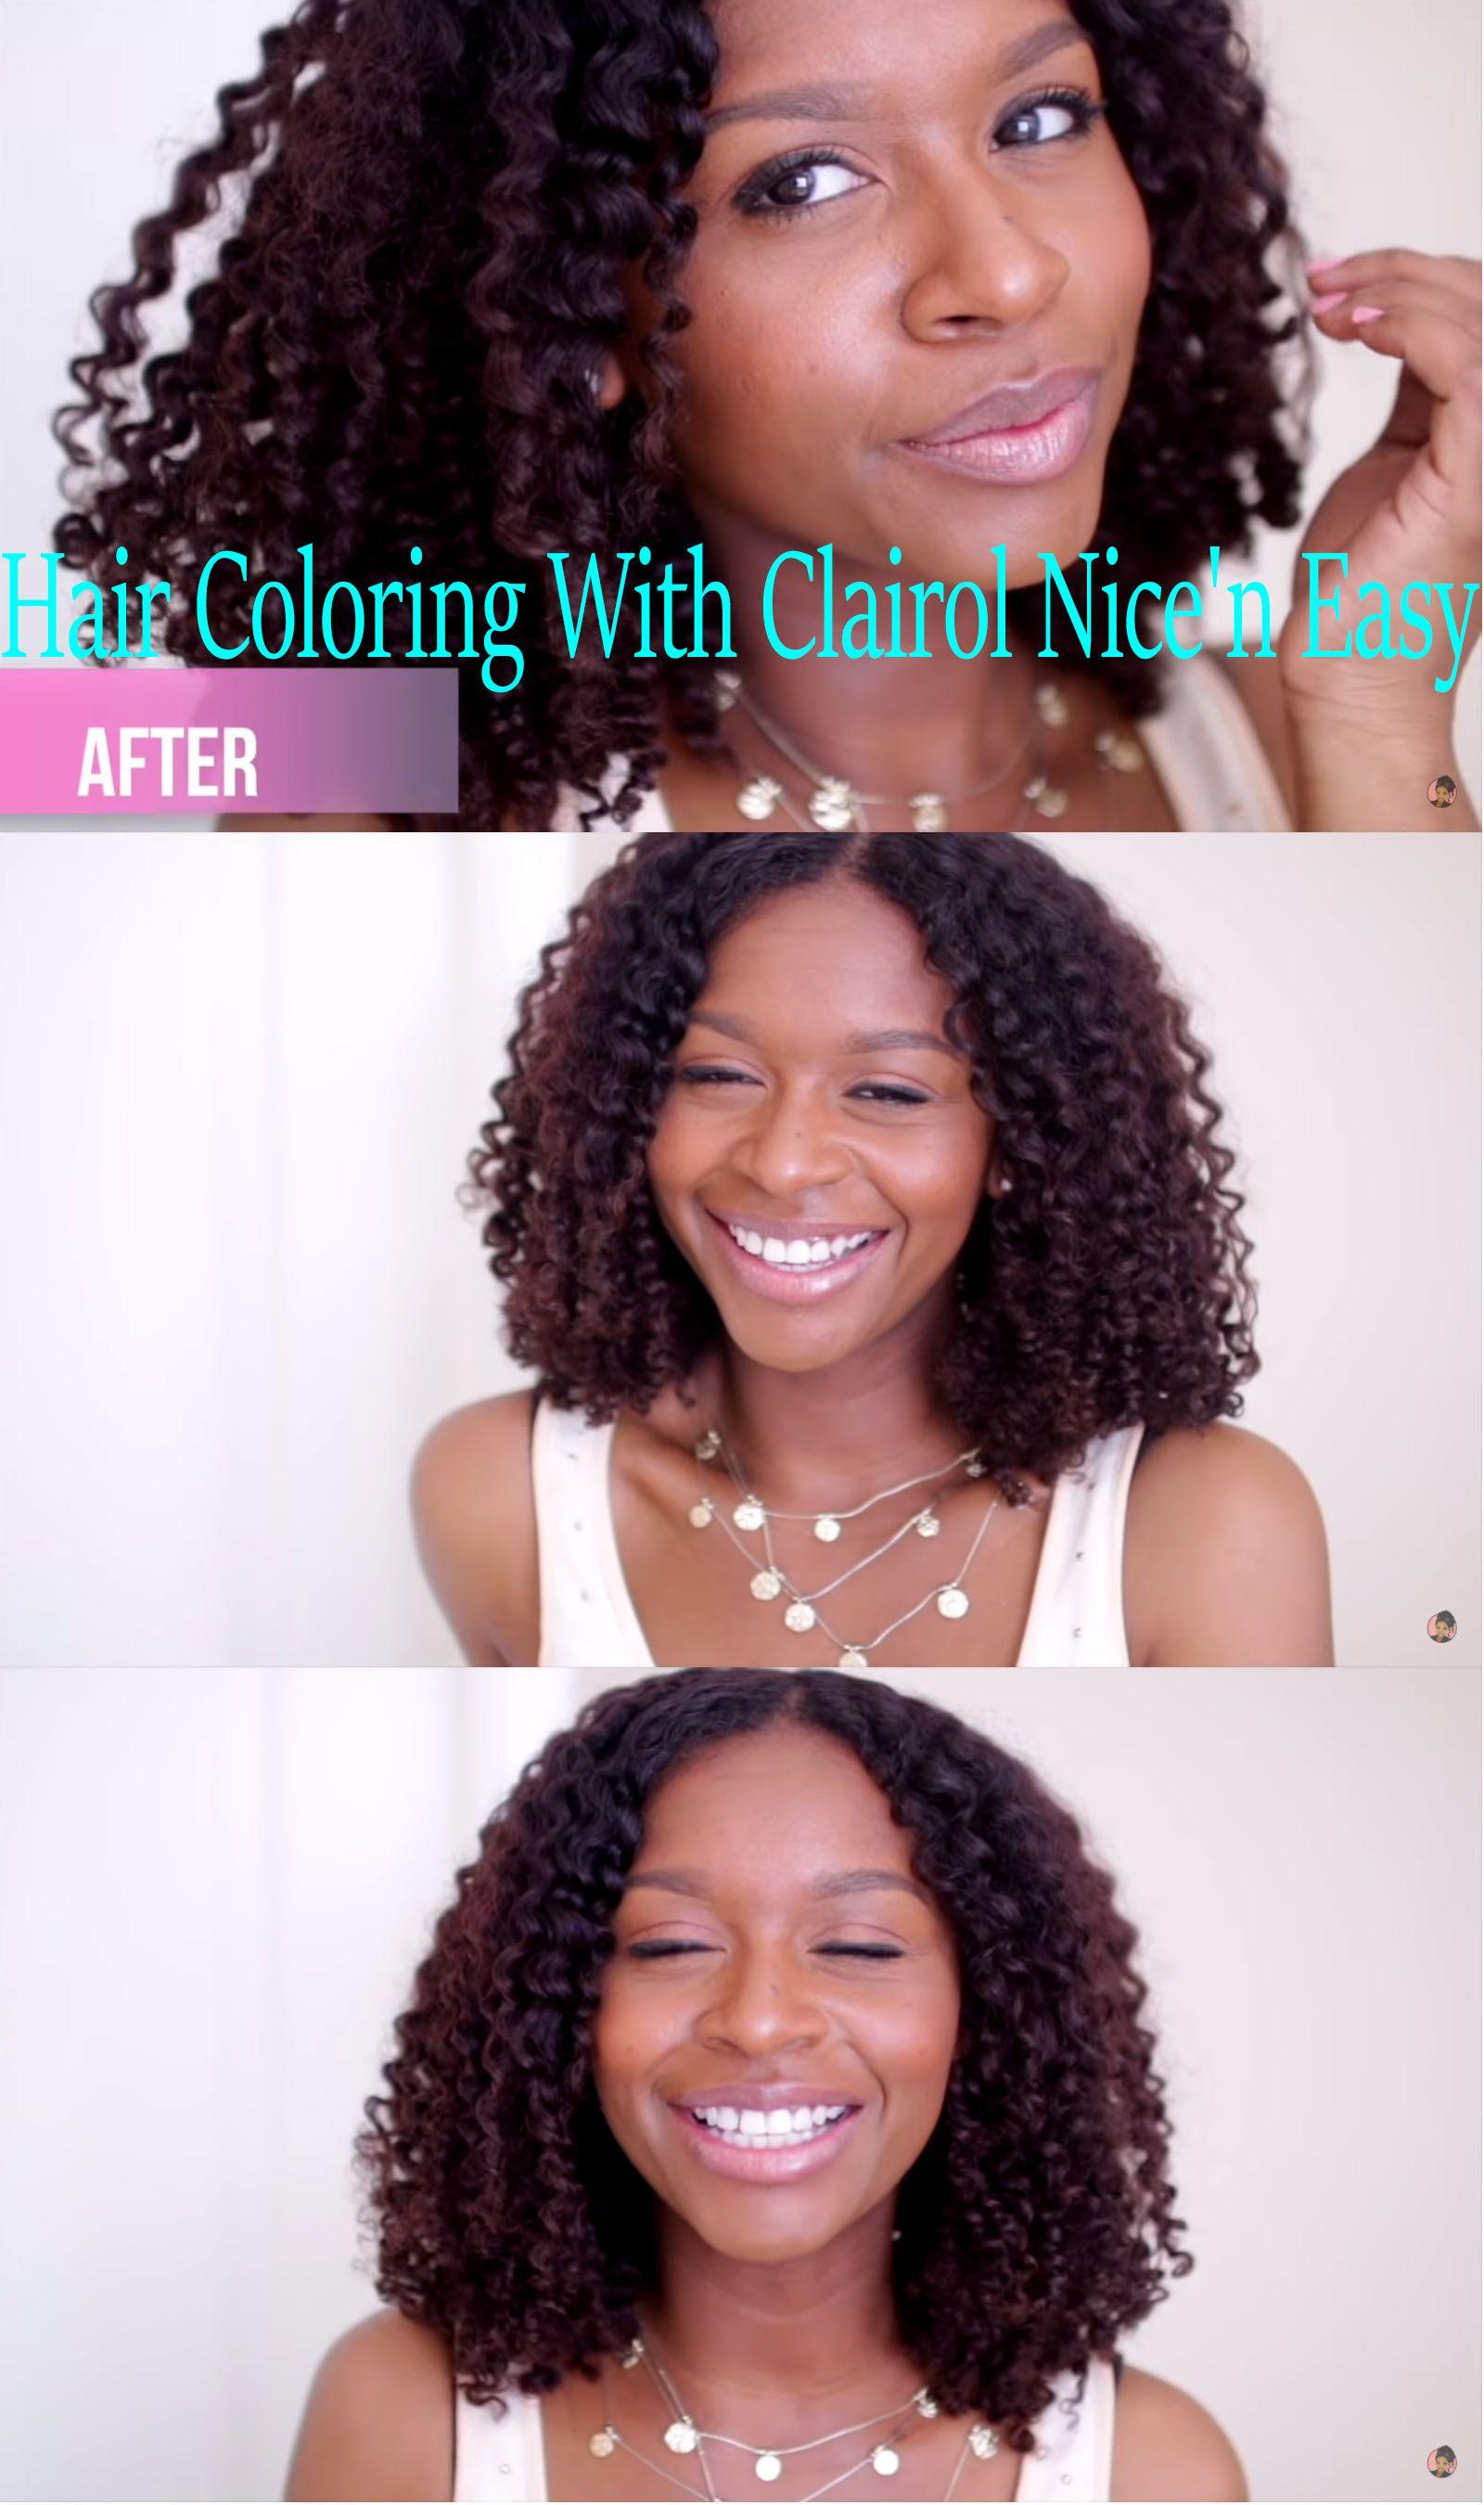 Natural hair coloring tutorial using Clairol Nice n Easy Medium